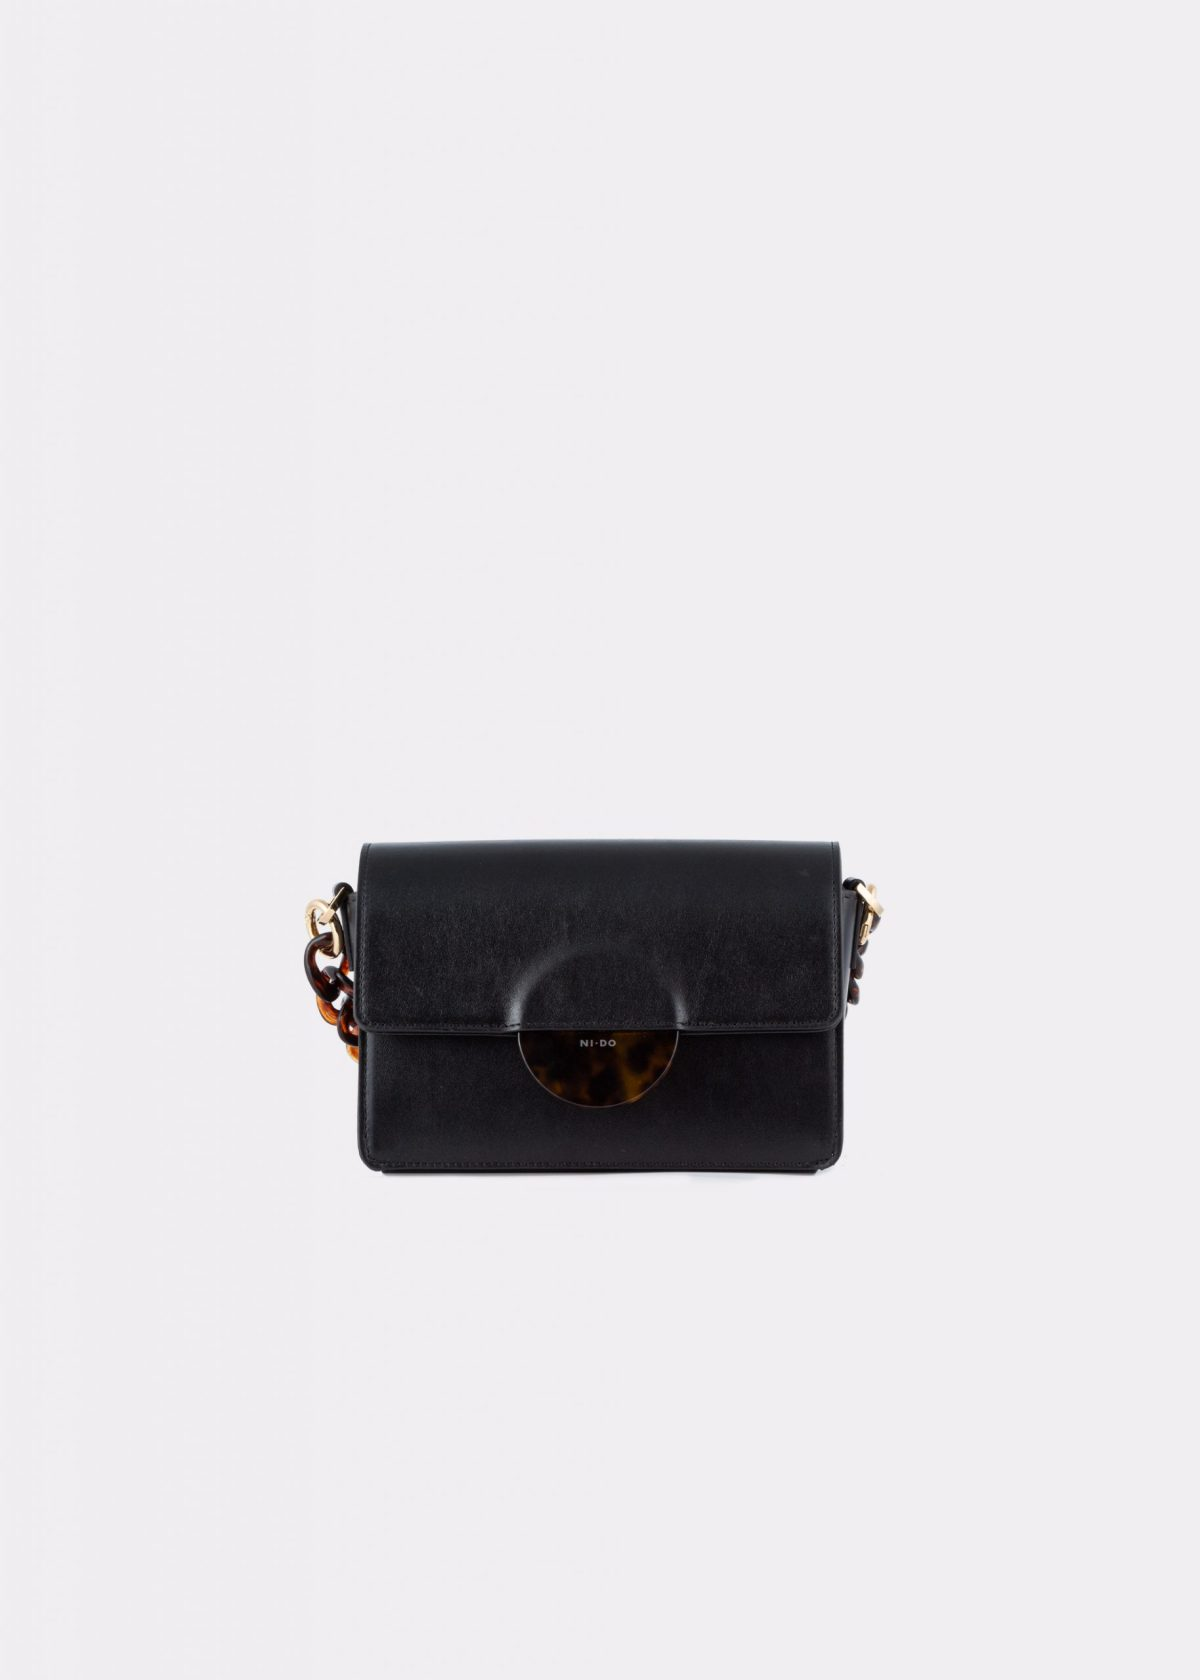 NIDO Cuore Mini bag Black front view